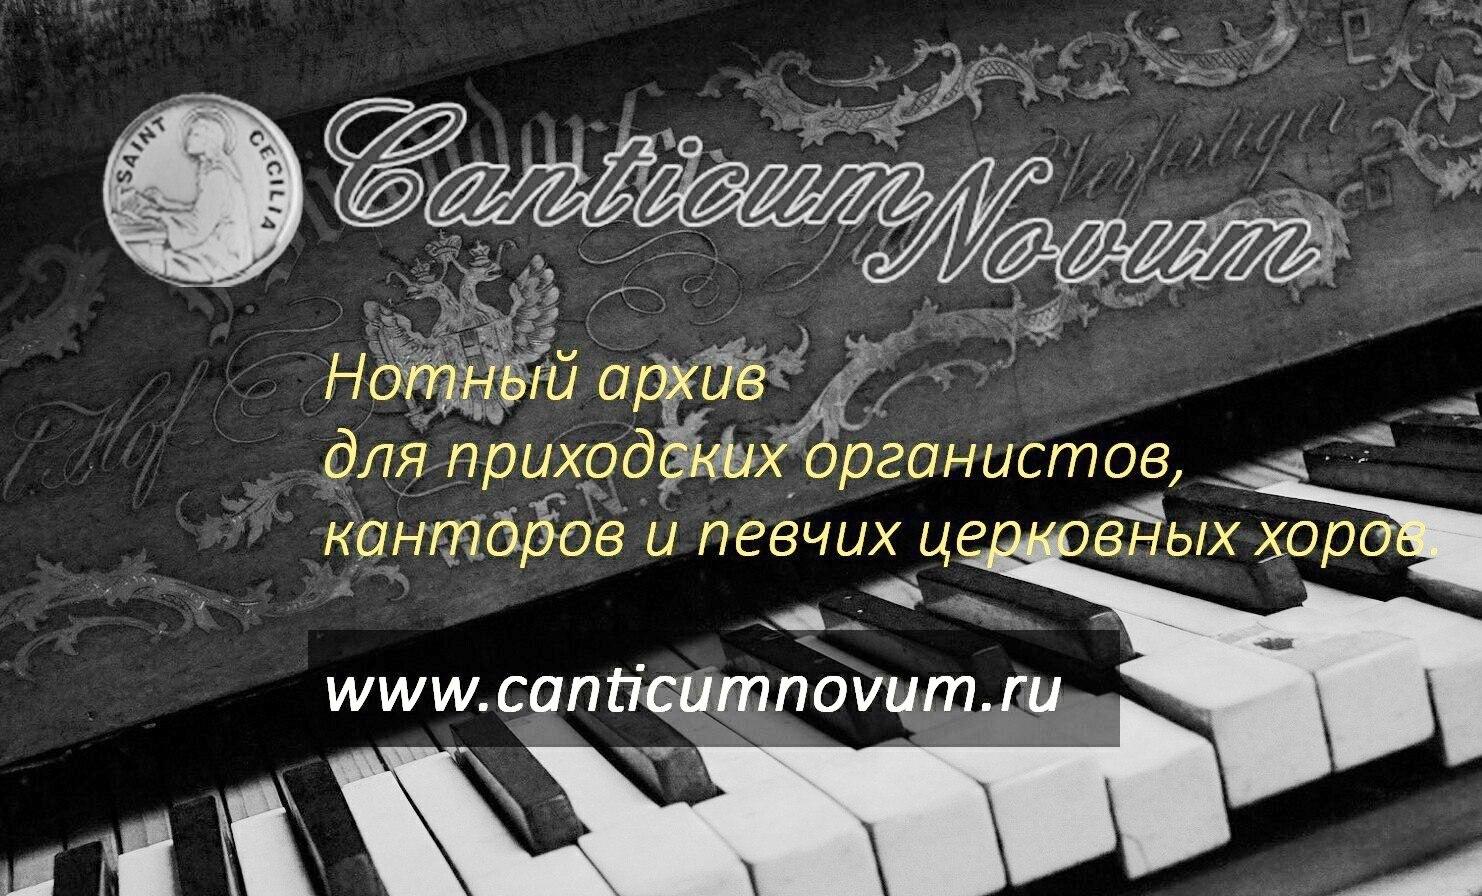 ЗАХОДИТЕ НА САЙТ CANTICUM NOVUM!